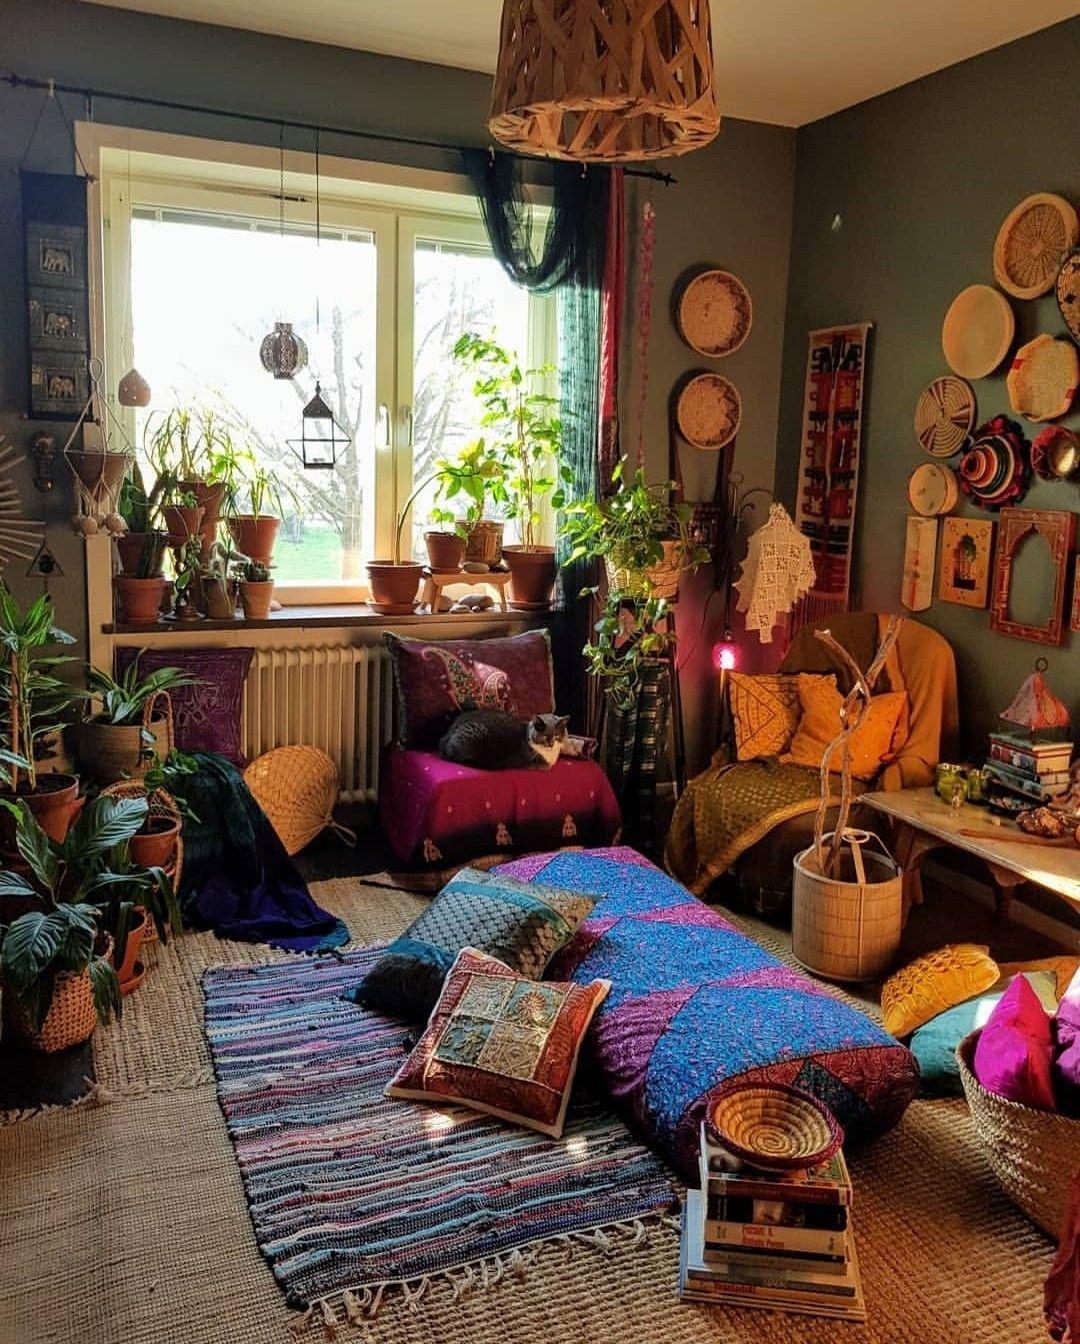 16+ Savory Modern Home Decor Living Room Ideas images